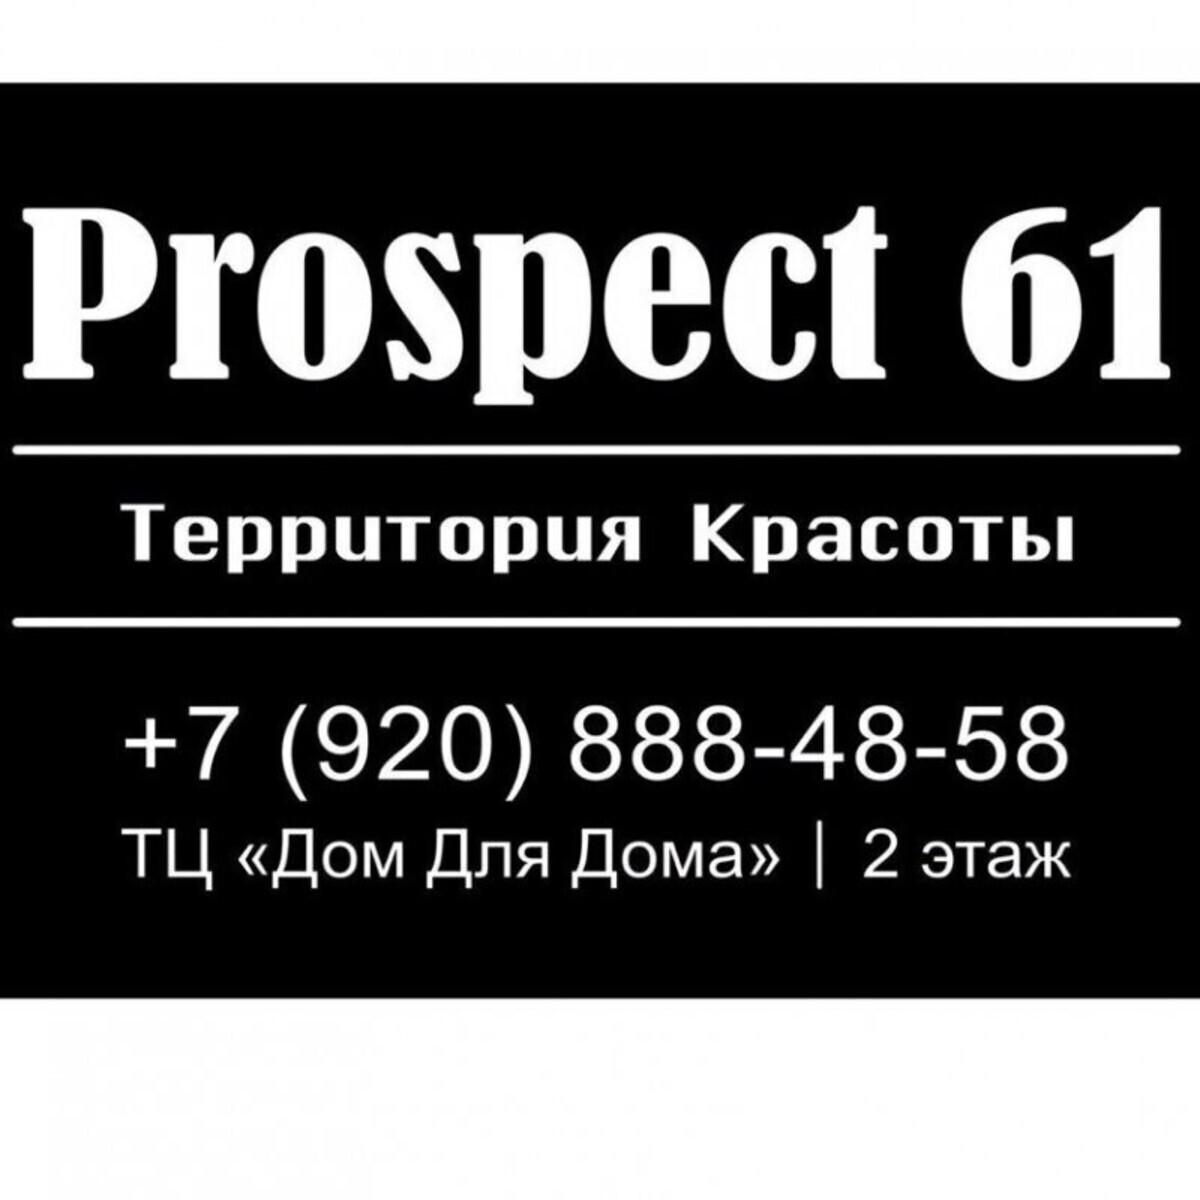 Prospect 61